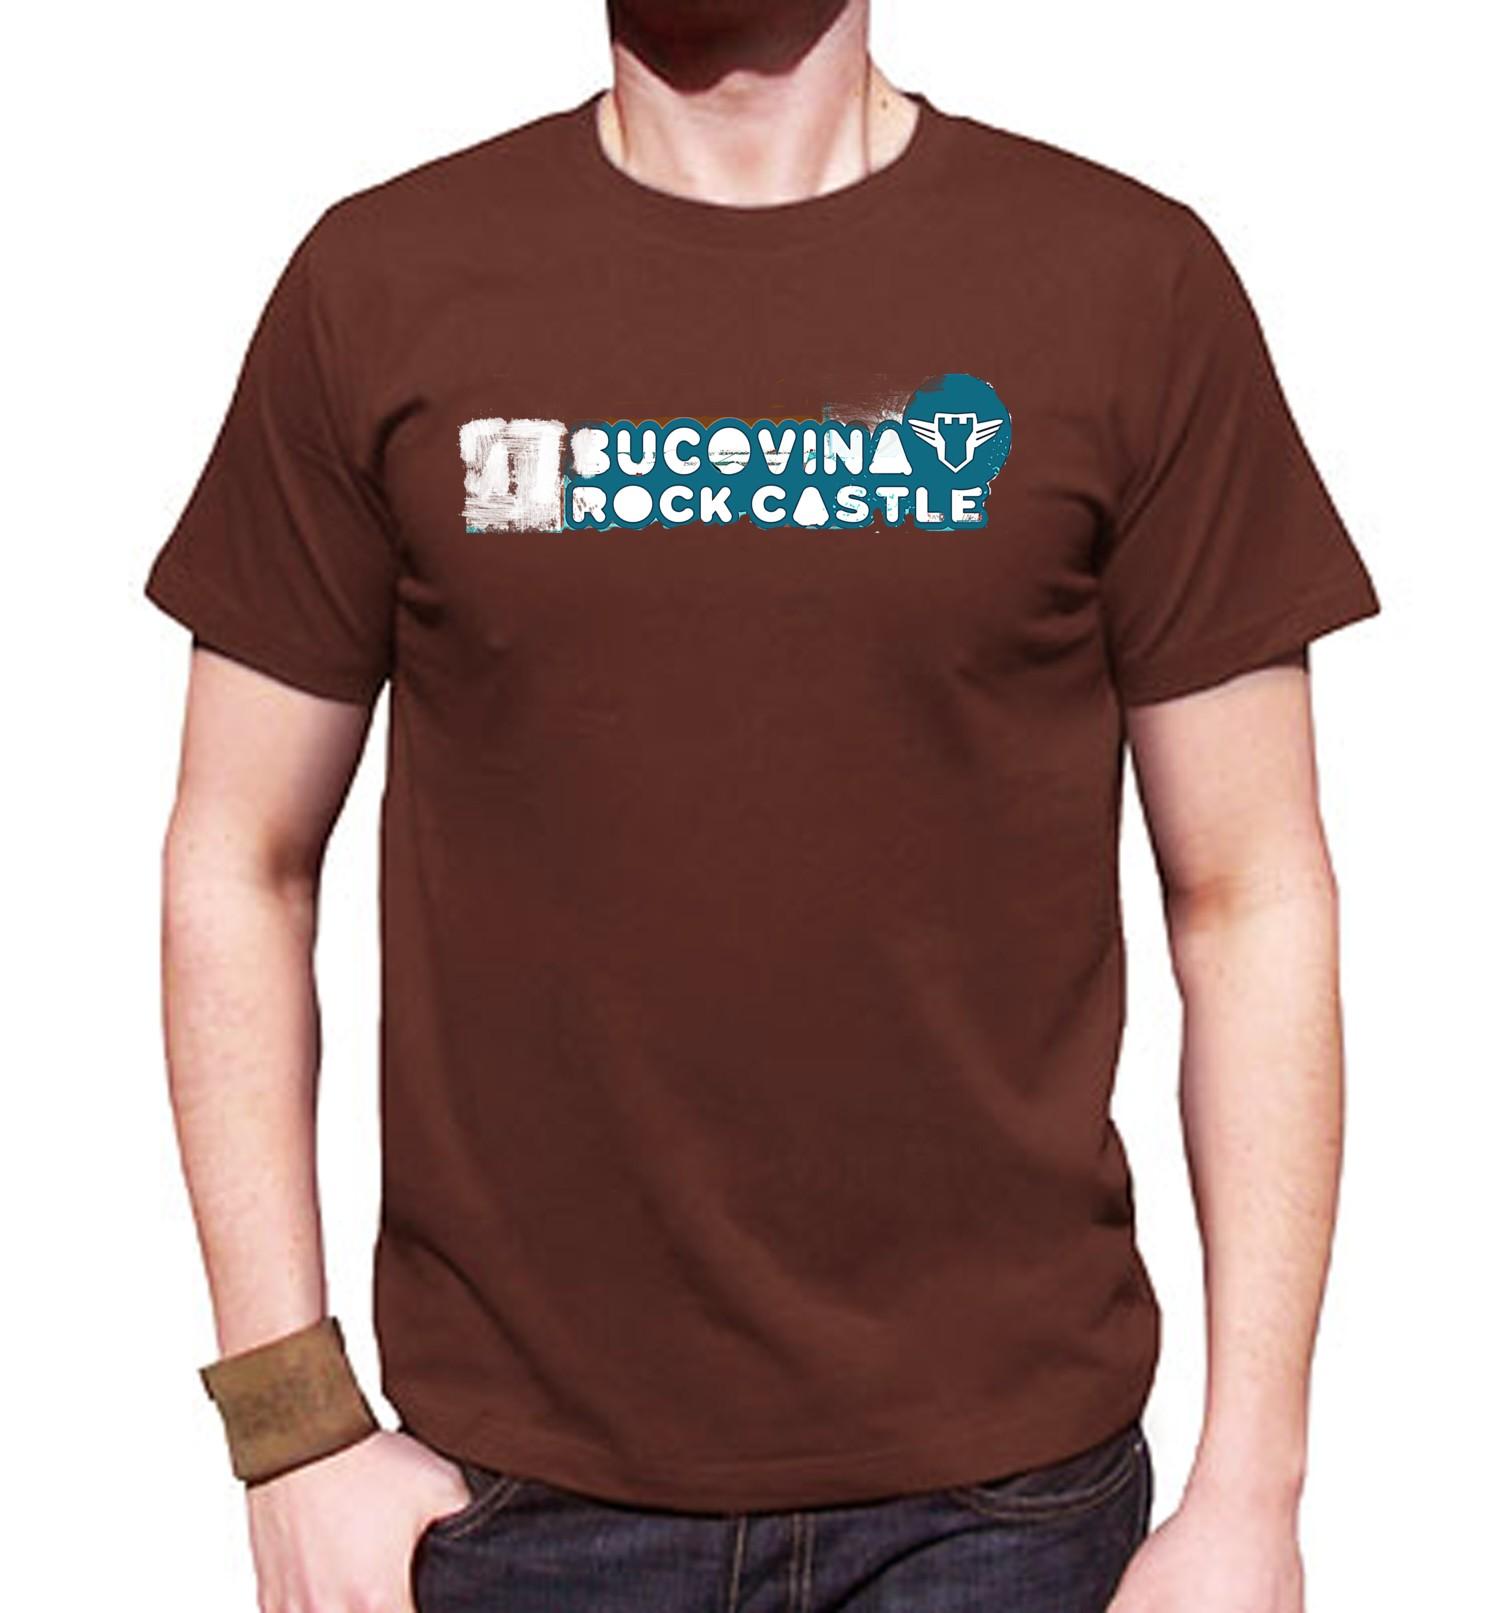 Tricoul Bucovina Rock Castle 2015, lucrat de Lucian Csibi, de la RELATIVE